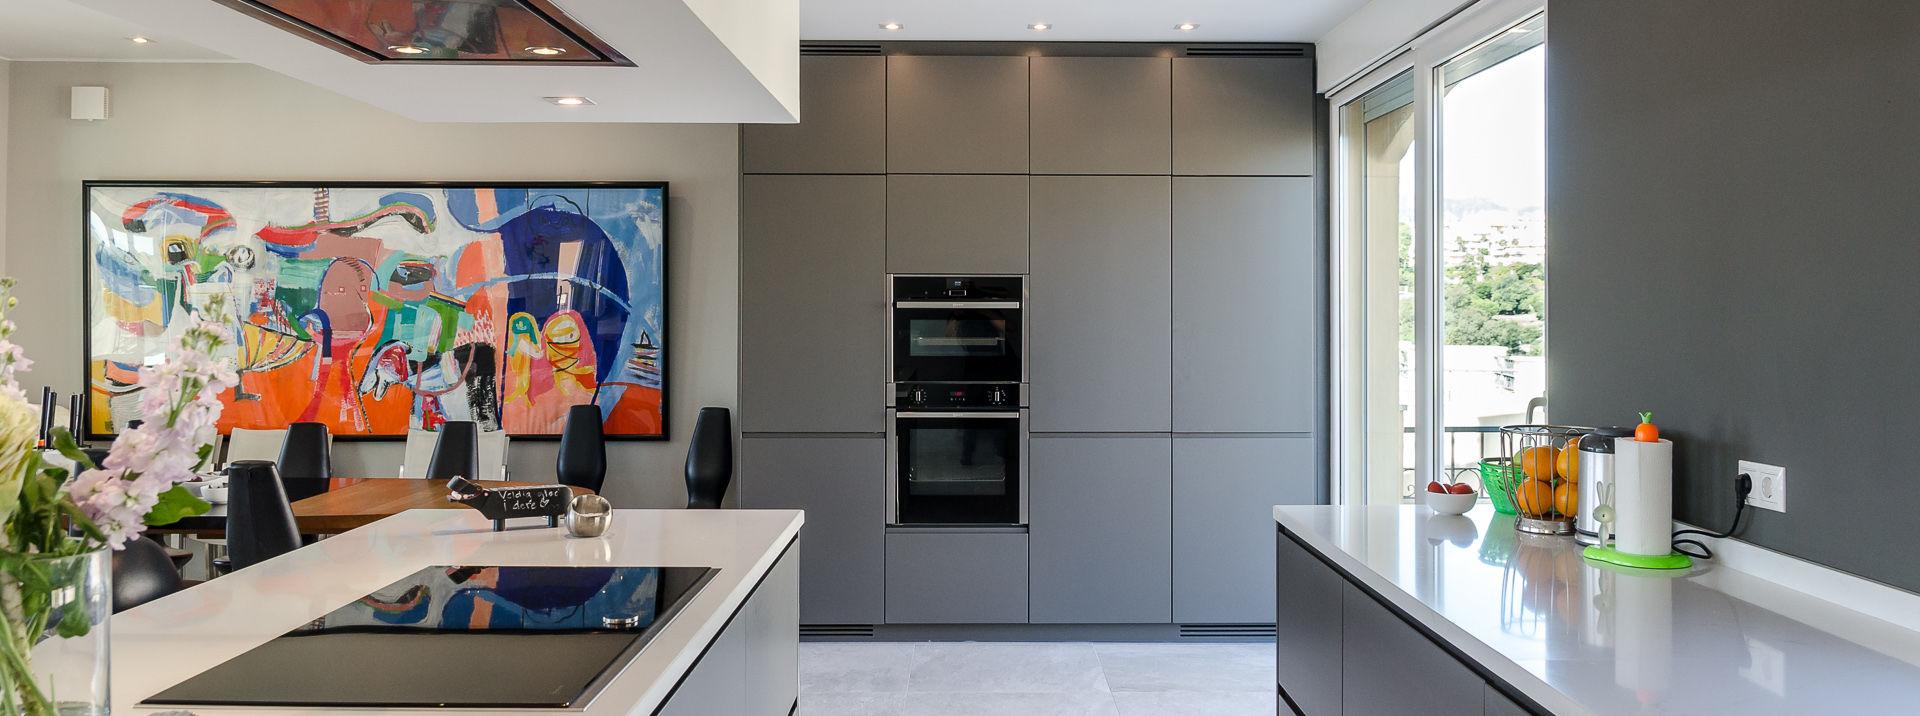 Nordic Muebles - Kitchens - Modern - Palencia